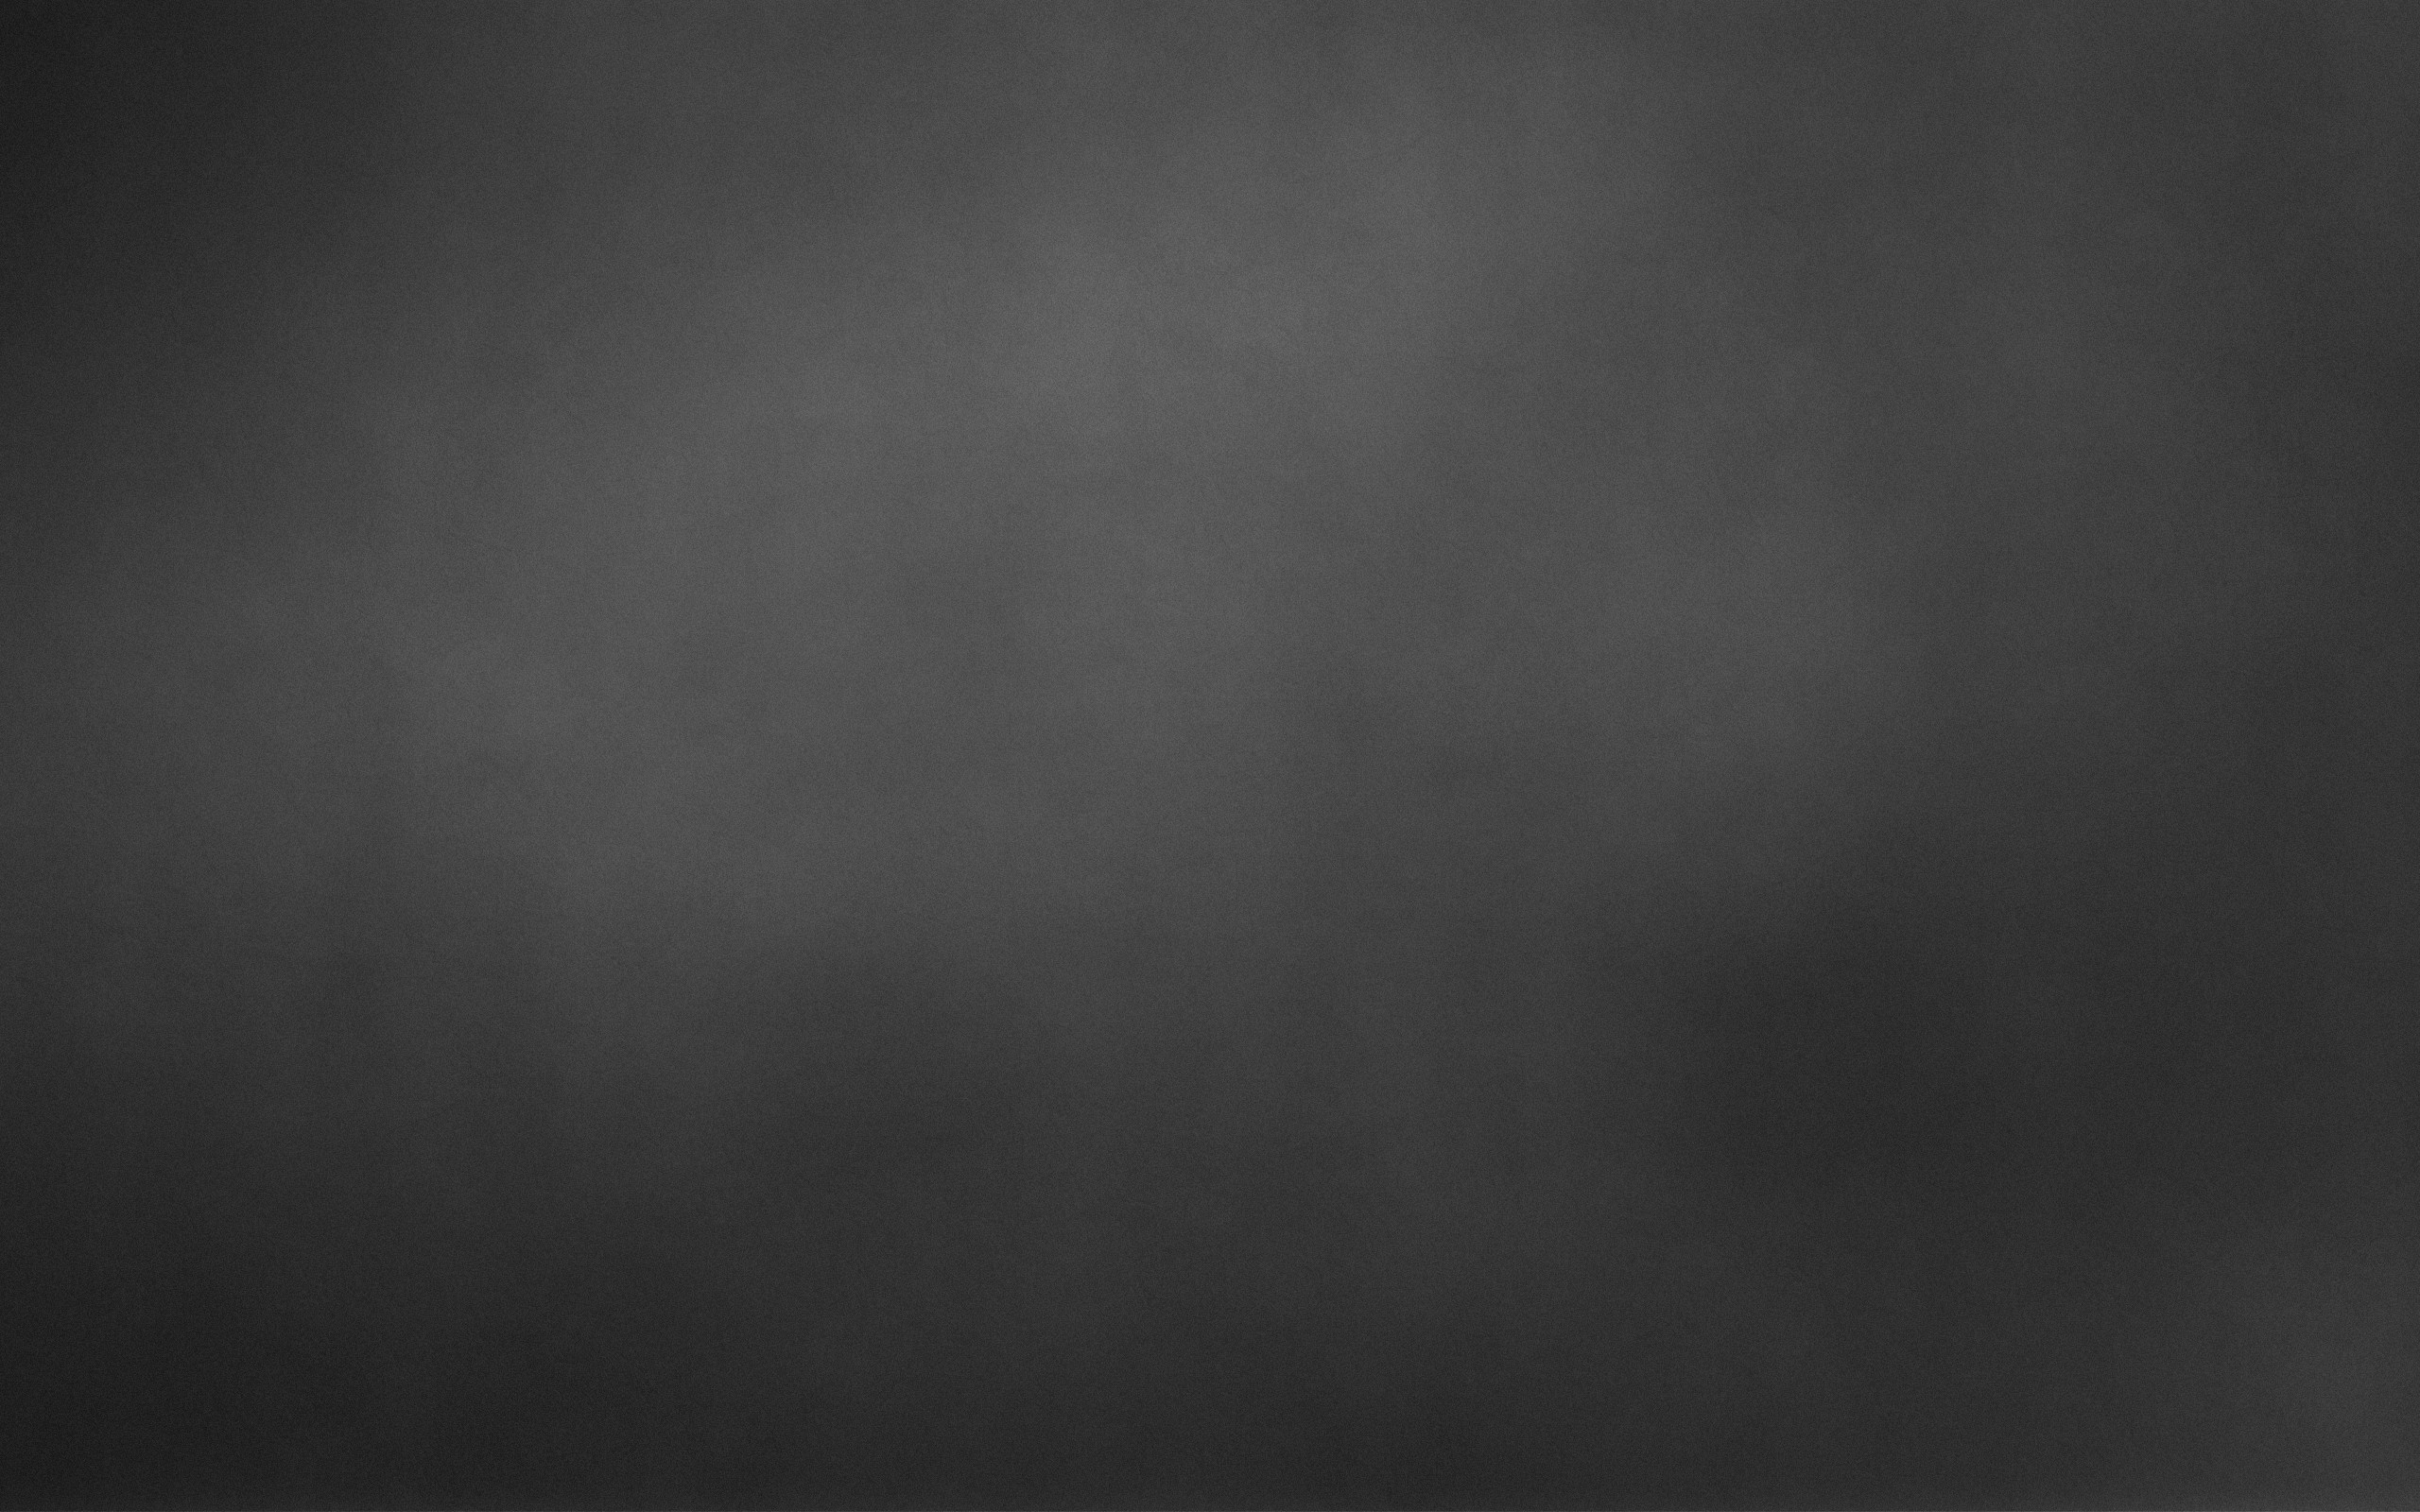 Minimalistic Gray Wallpaper Minimalistic, Gray, Textures